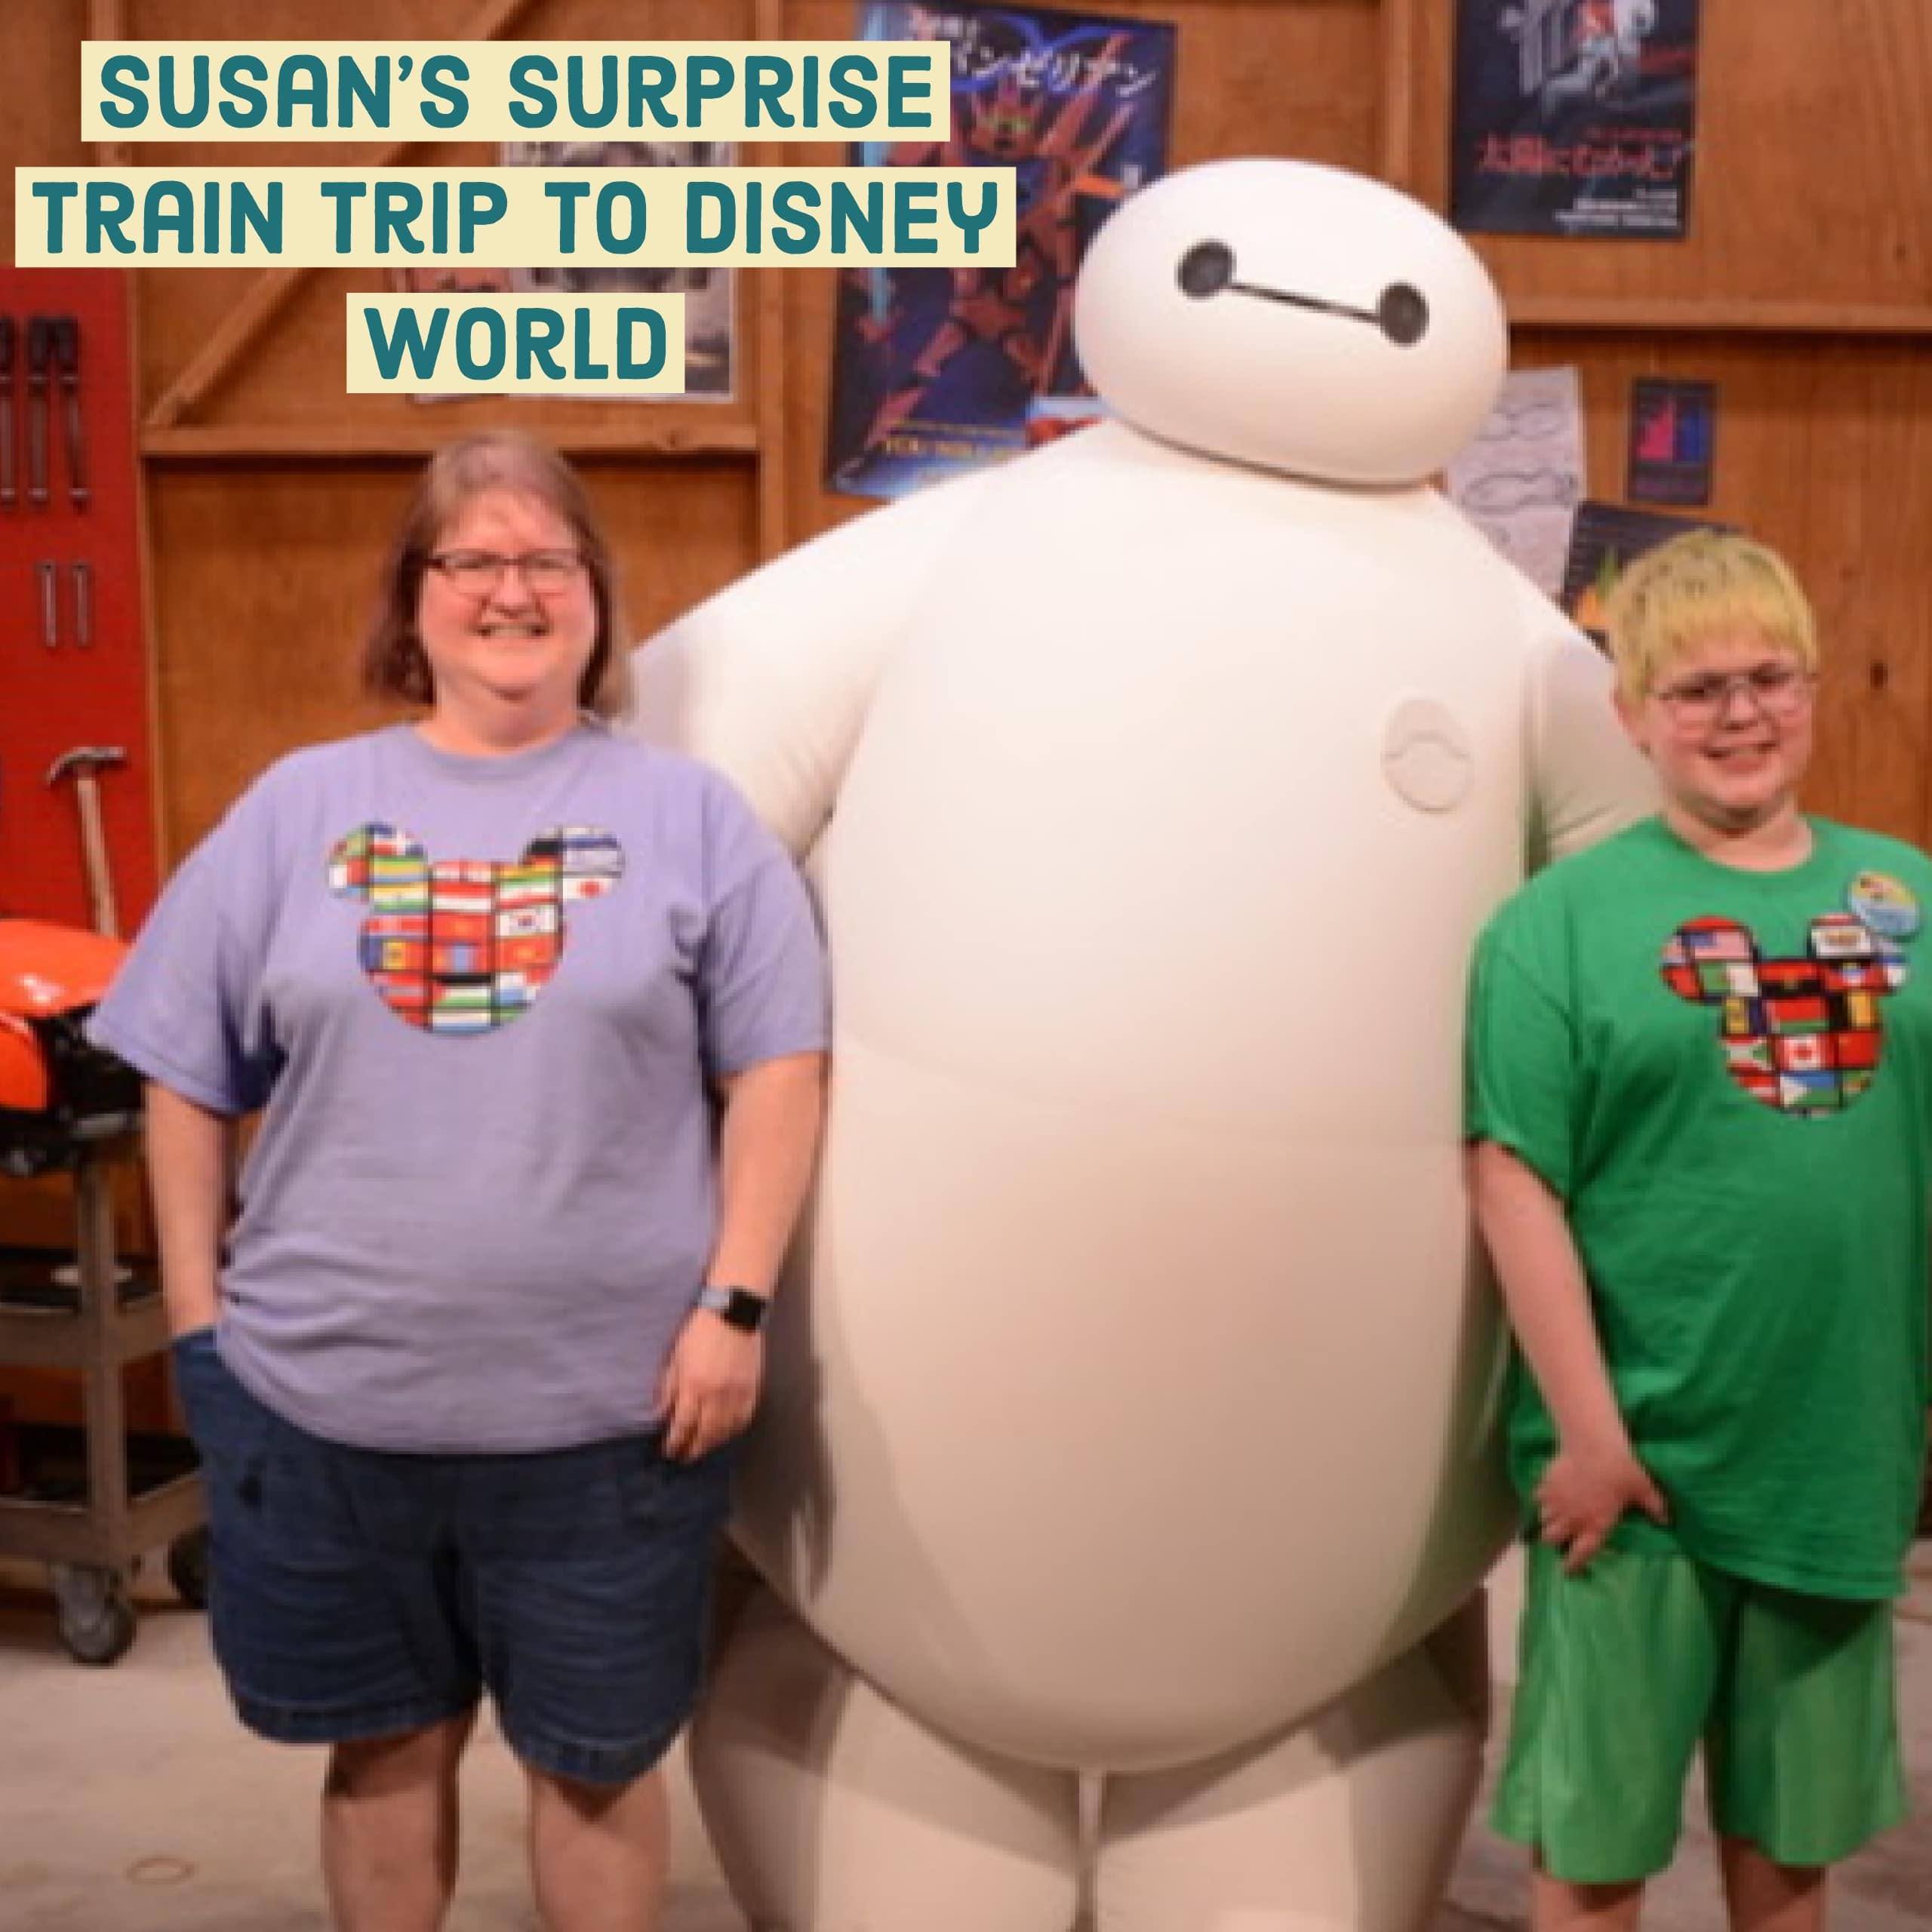 Susan's surprise train trip to Disney World FB